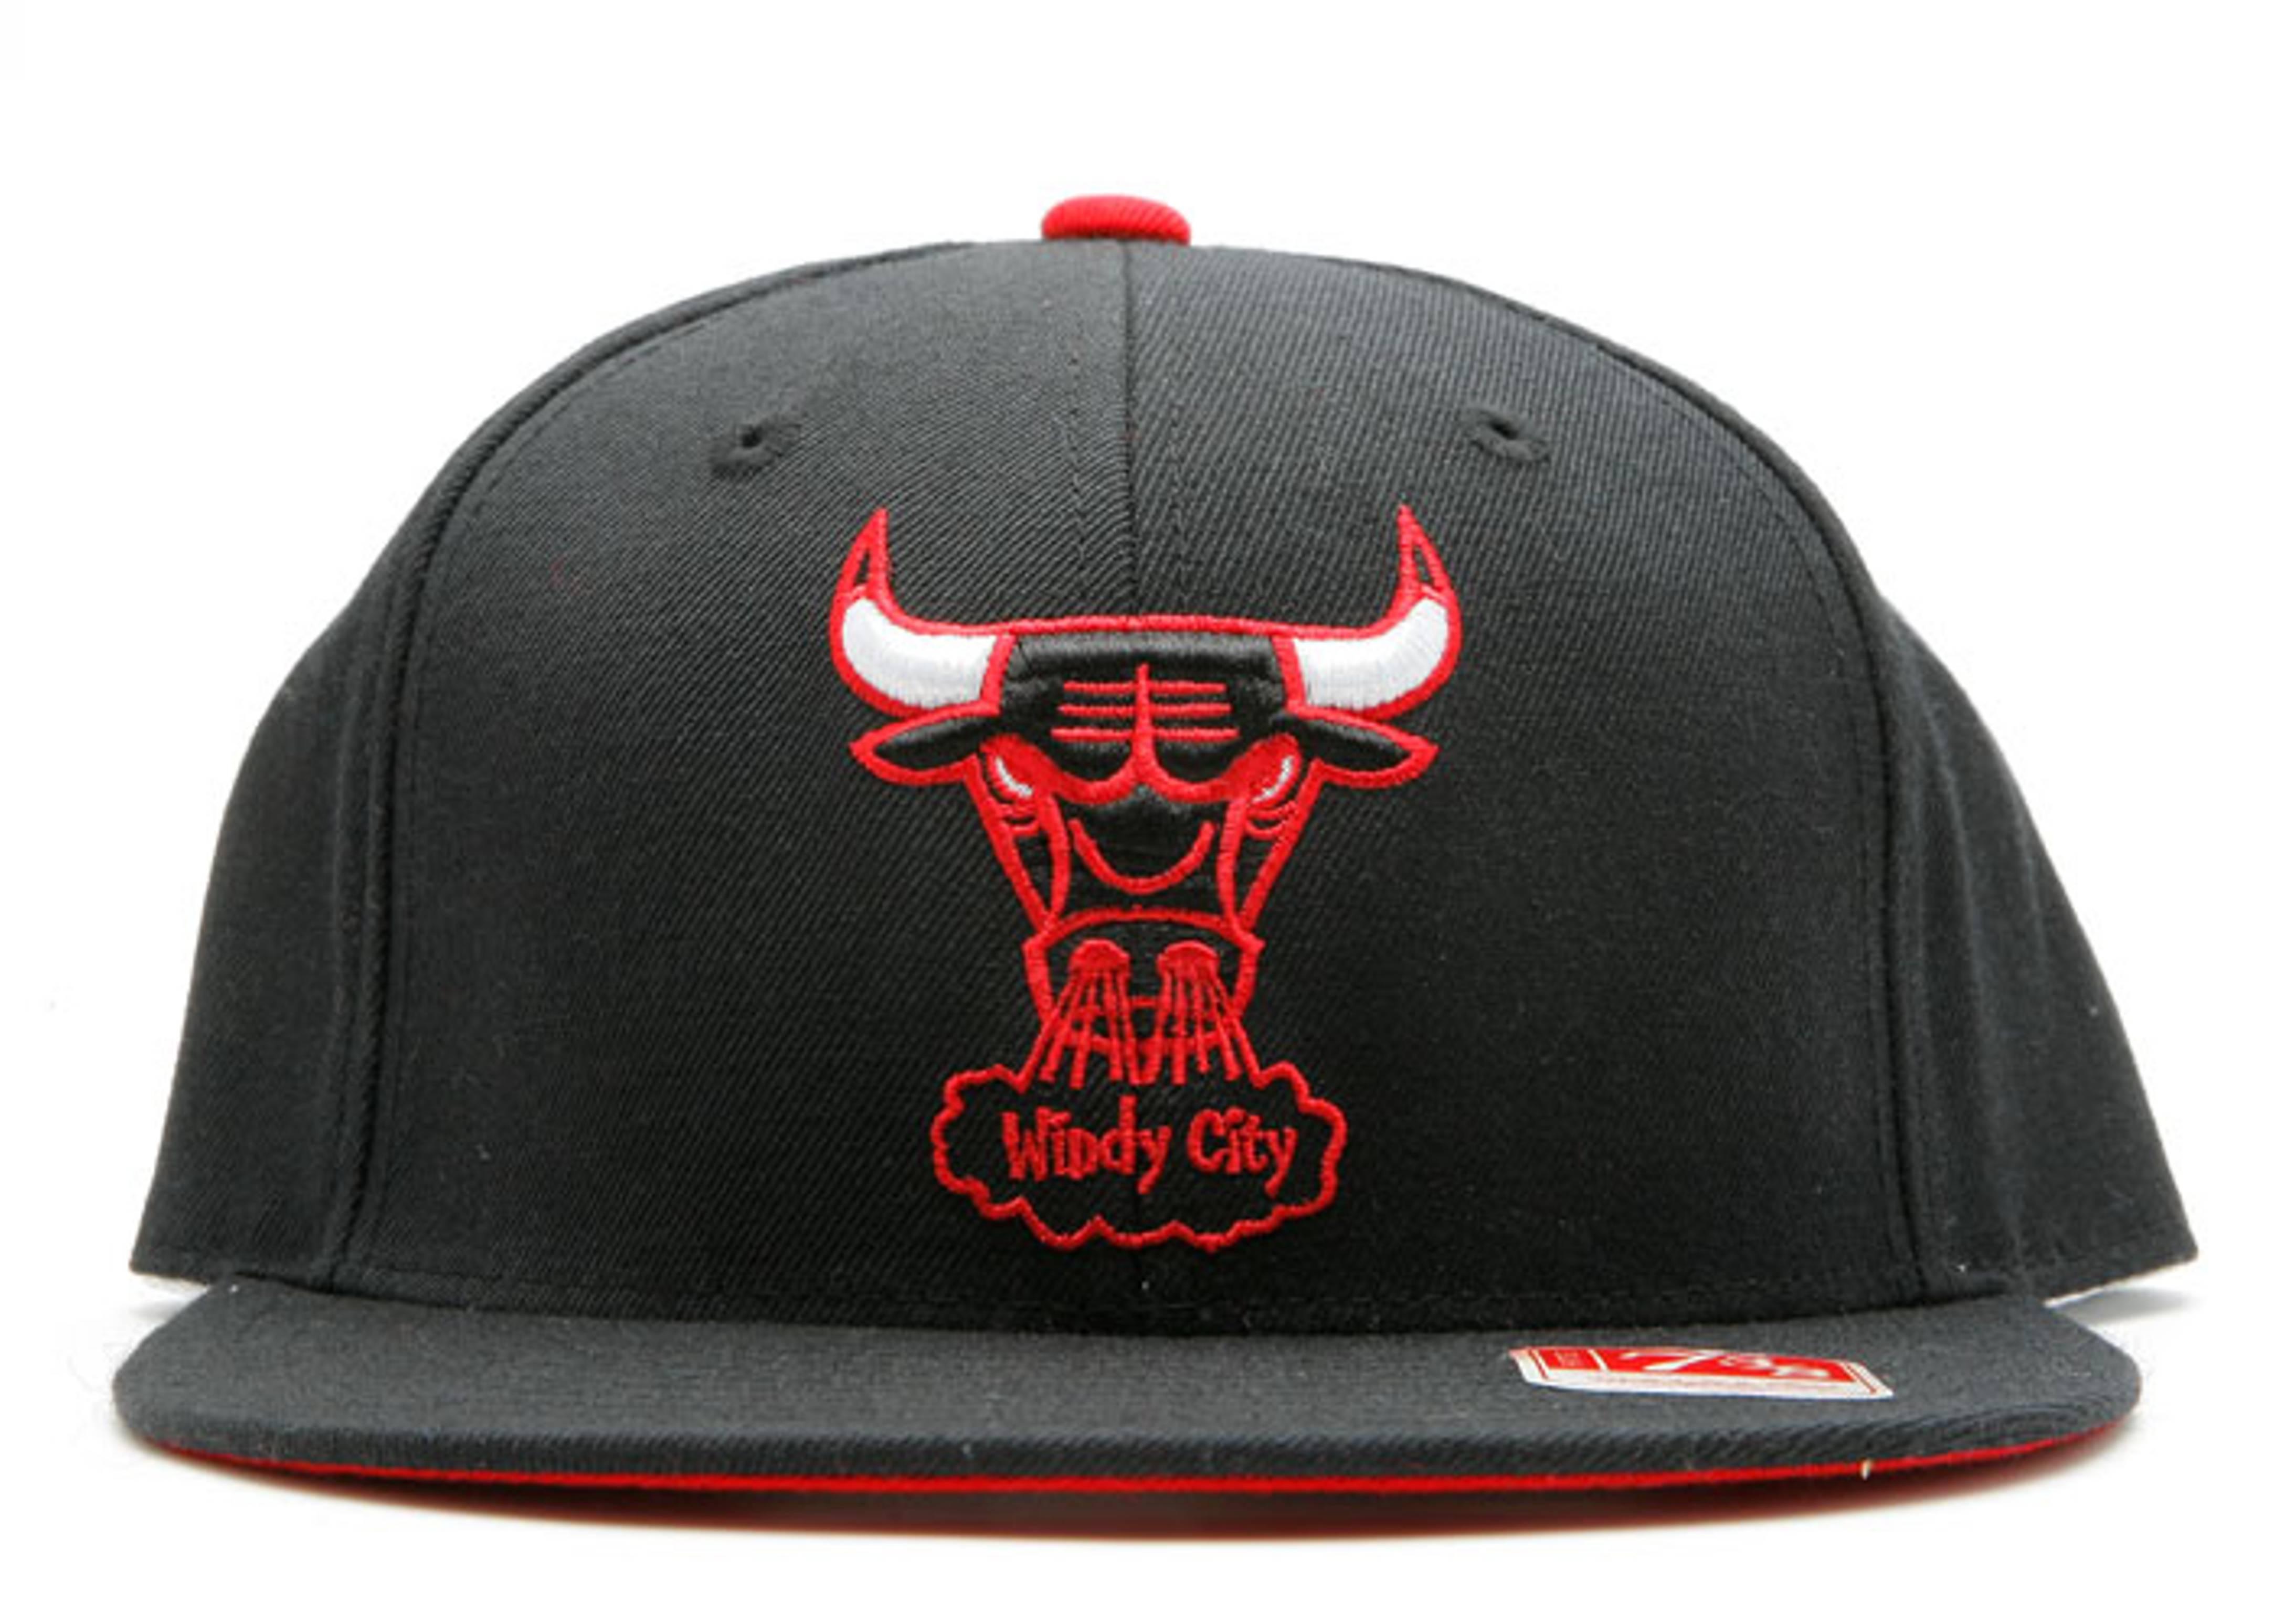 48fffbc1a27 Chicago Bulls Fitted